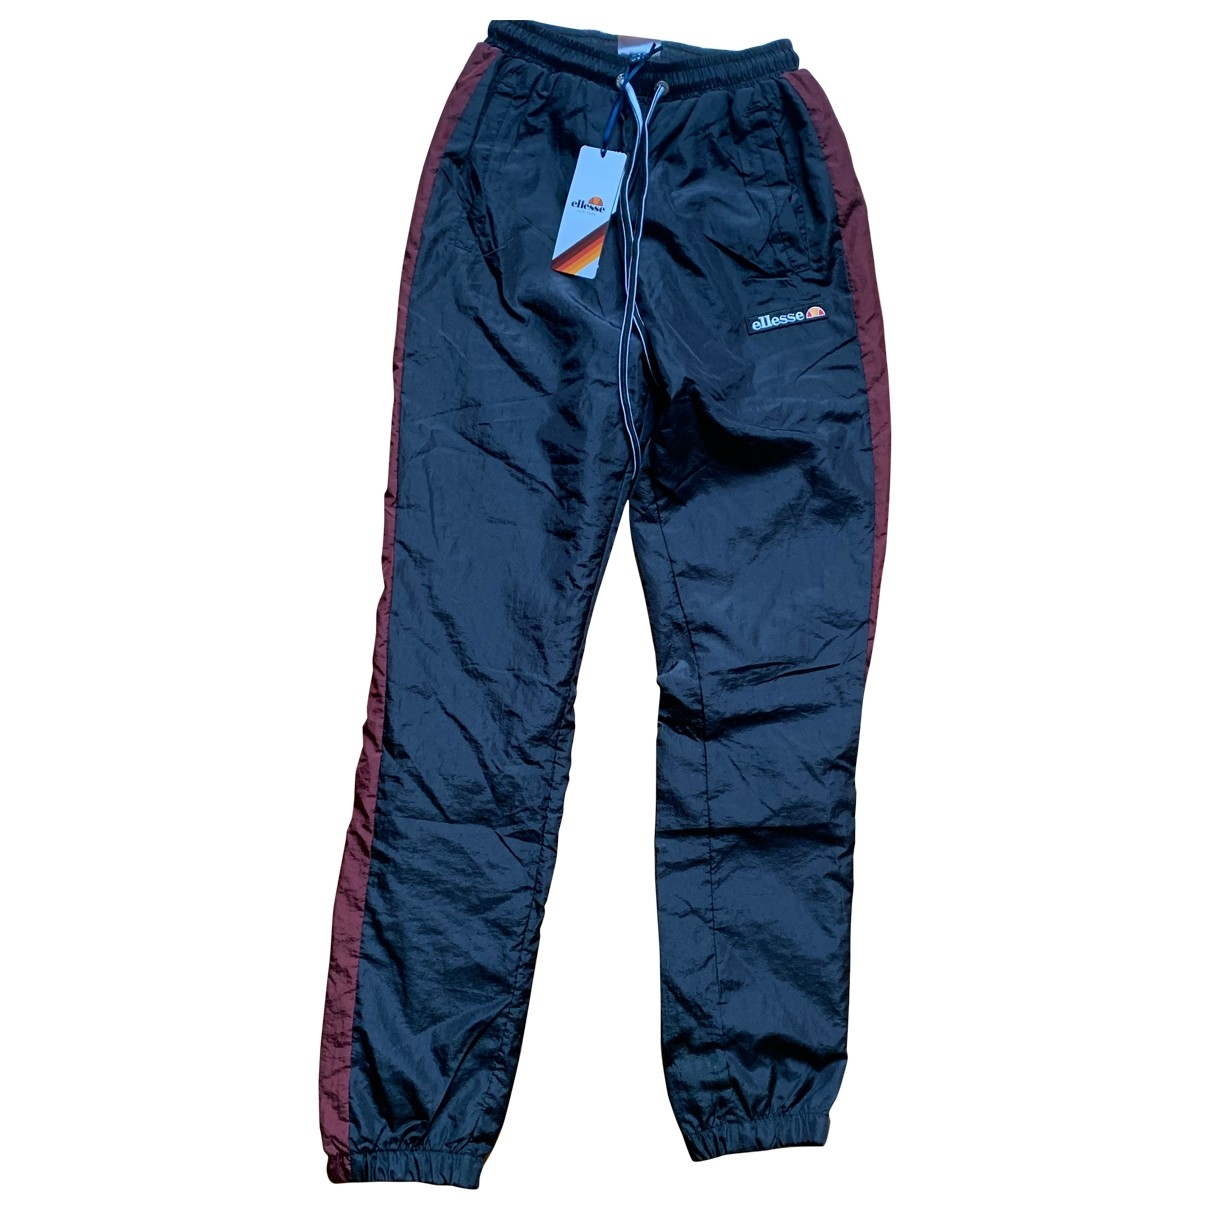 Ellesse \N Black Trousers for Women S International